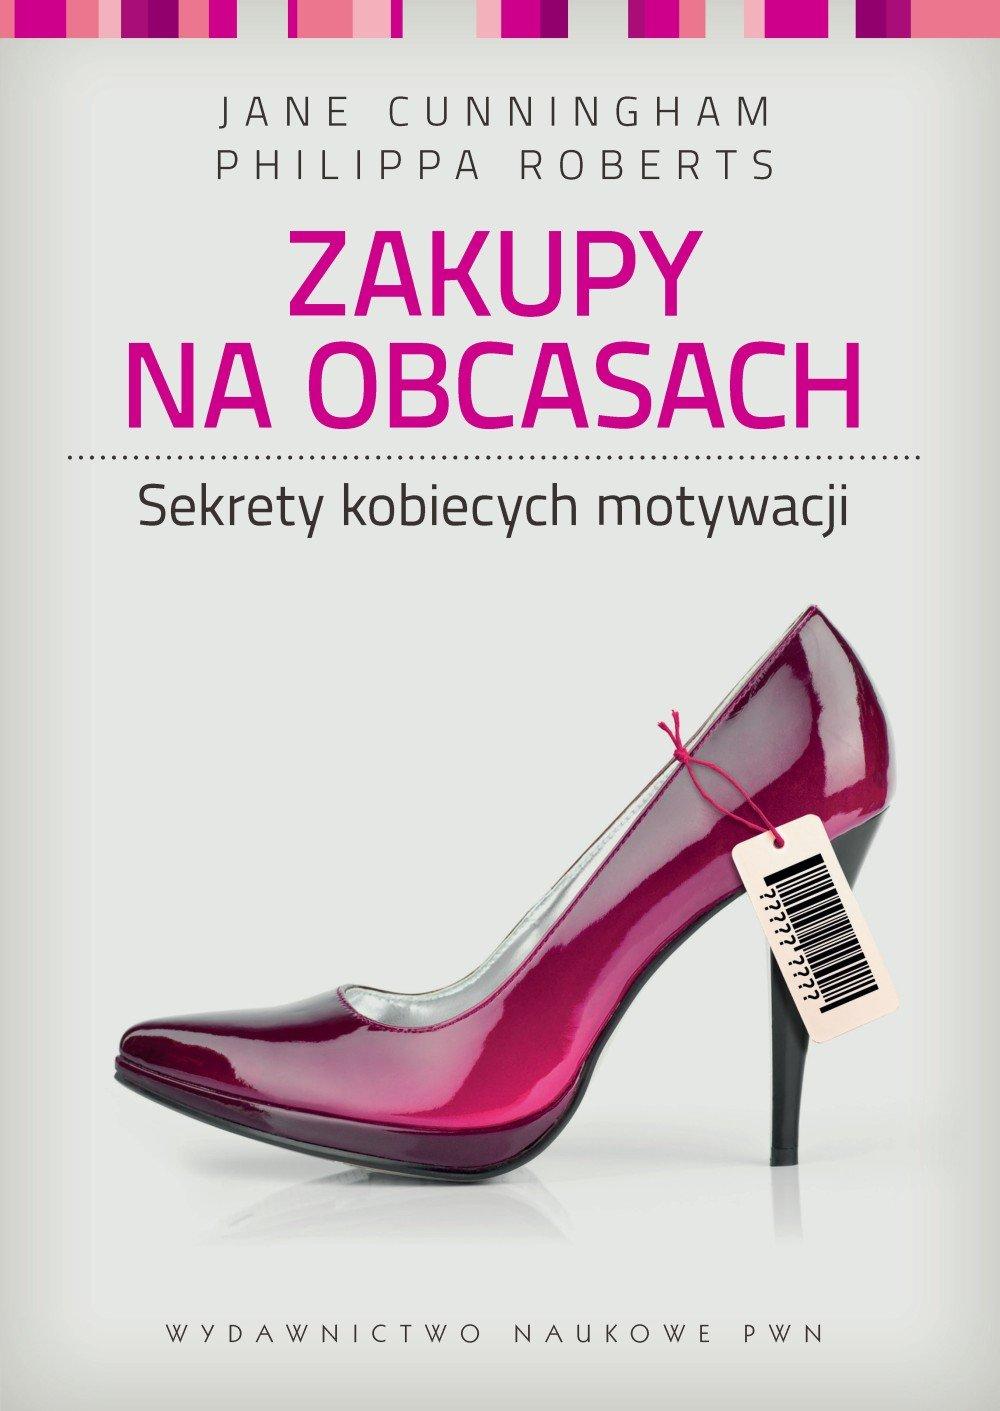 Zakupy na obcasach - Ebook (Książka EPUB) do pobrania w formacie EPUB